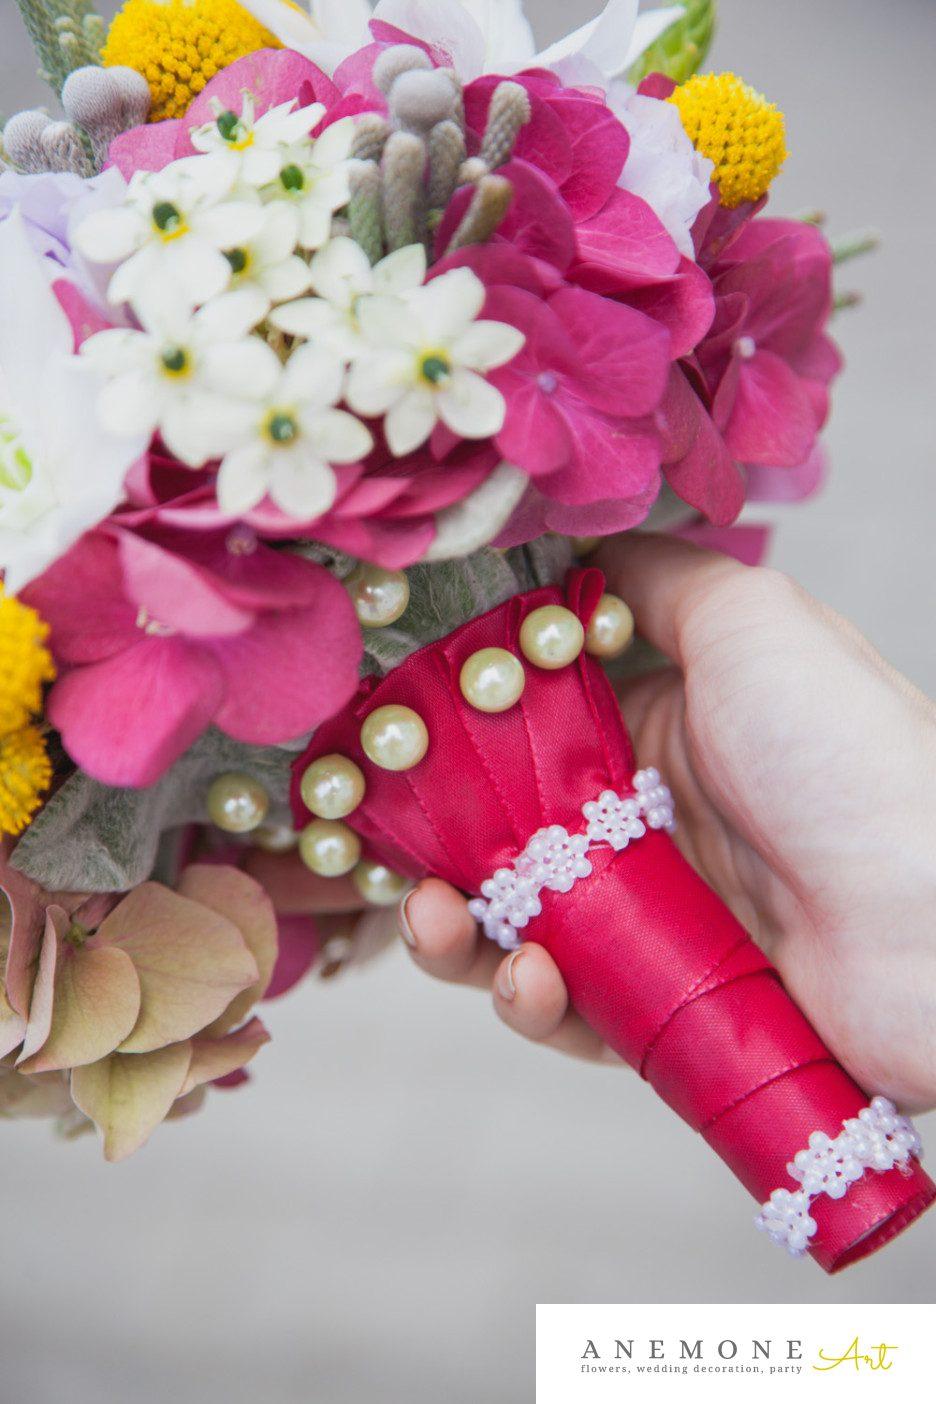 Poza, foto cu Flori de nunta brunia, buchet mireasa, craspedia, eucharis, maner buchet, multicolor, ornitogallum in Arad, Timisoara, Oradea (wedding flowers, bouquets) nunta Arad, Timisoara, Oradea